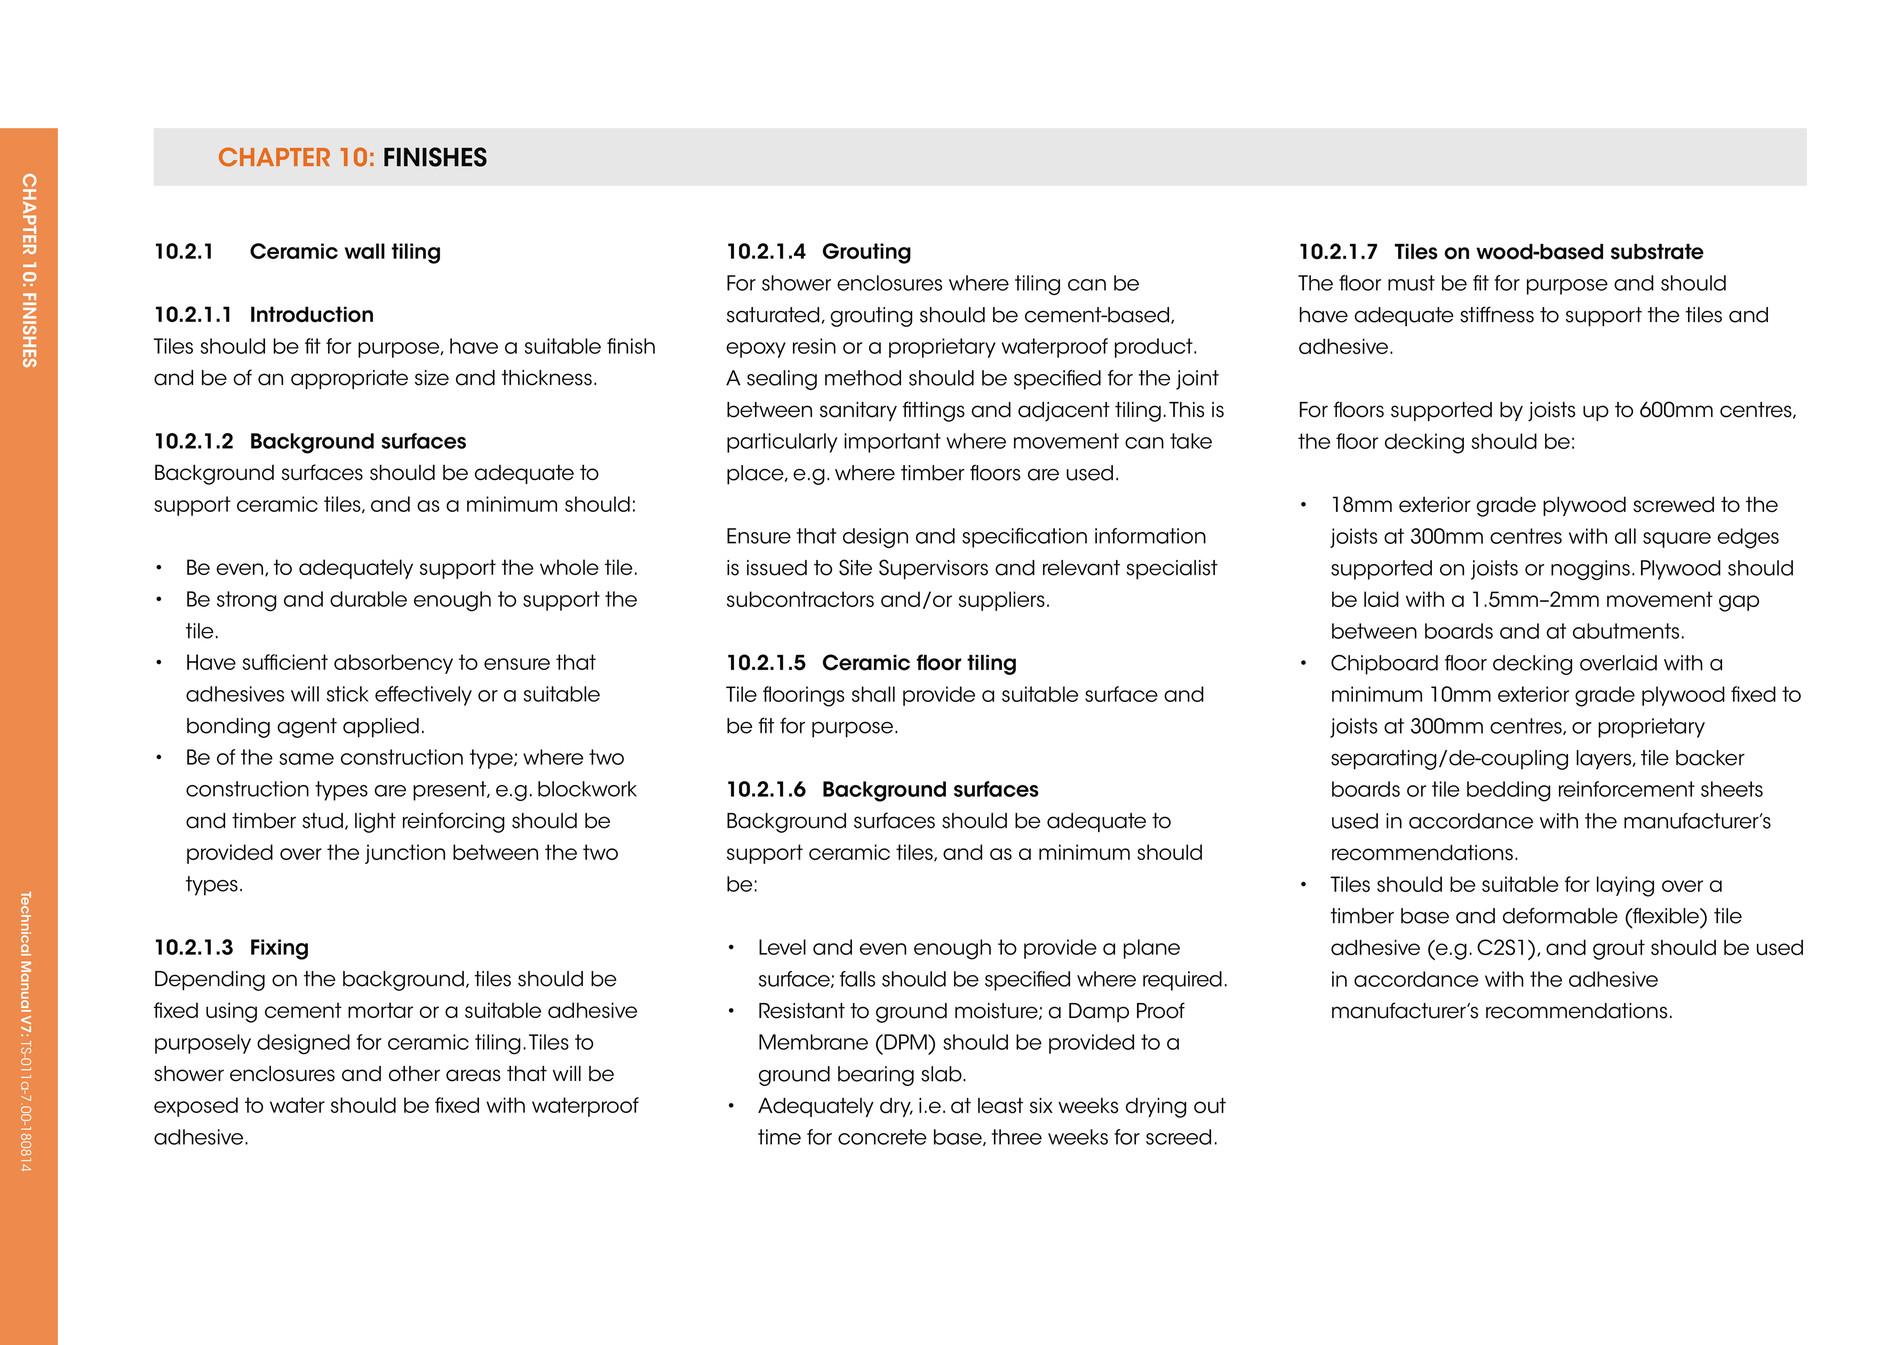 LABC Warranty Technical Manual Version 7 Page 294 295